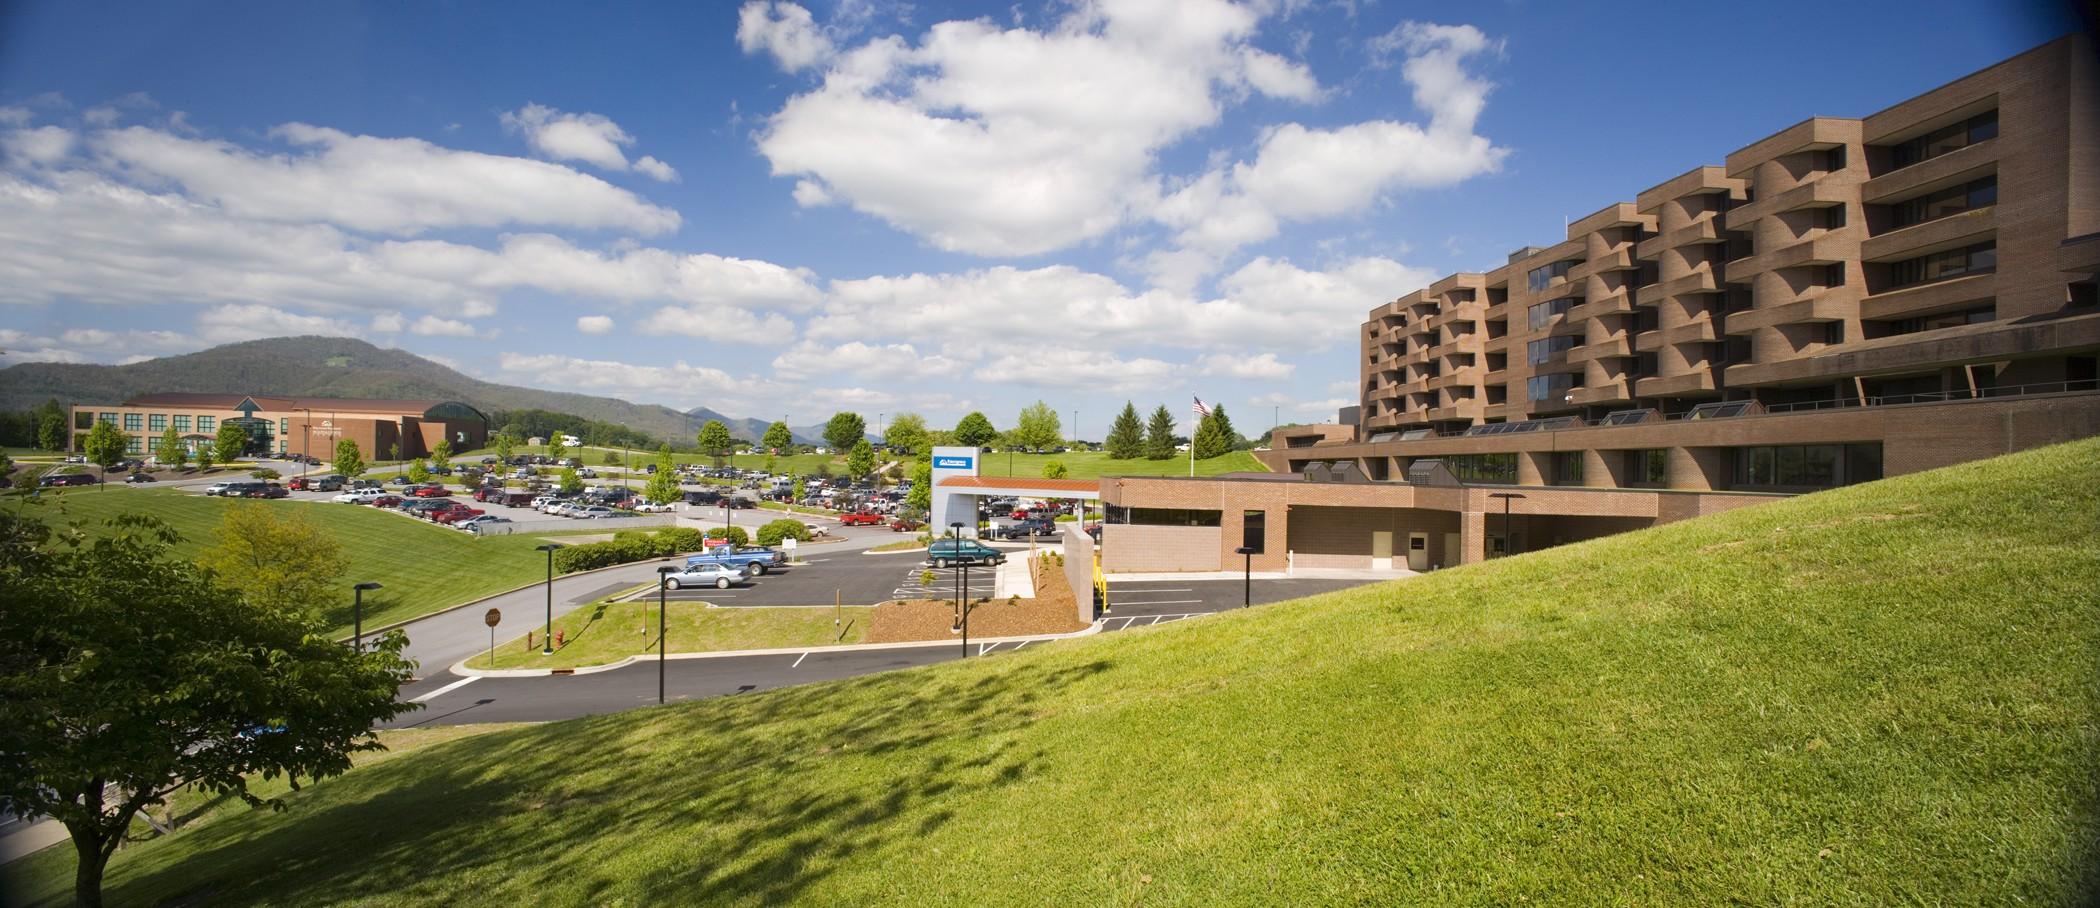 Haywood Regional Medical Center - A Duke LifePoint Hospital